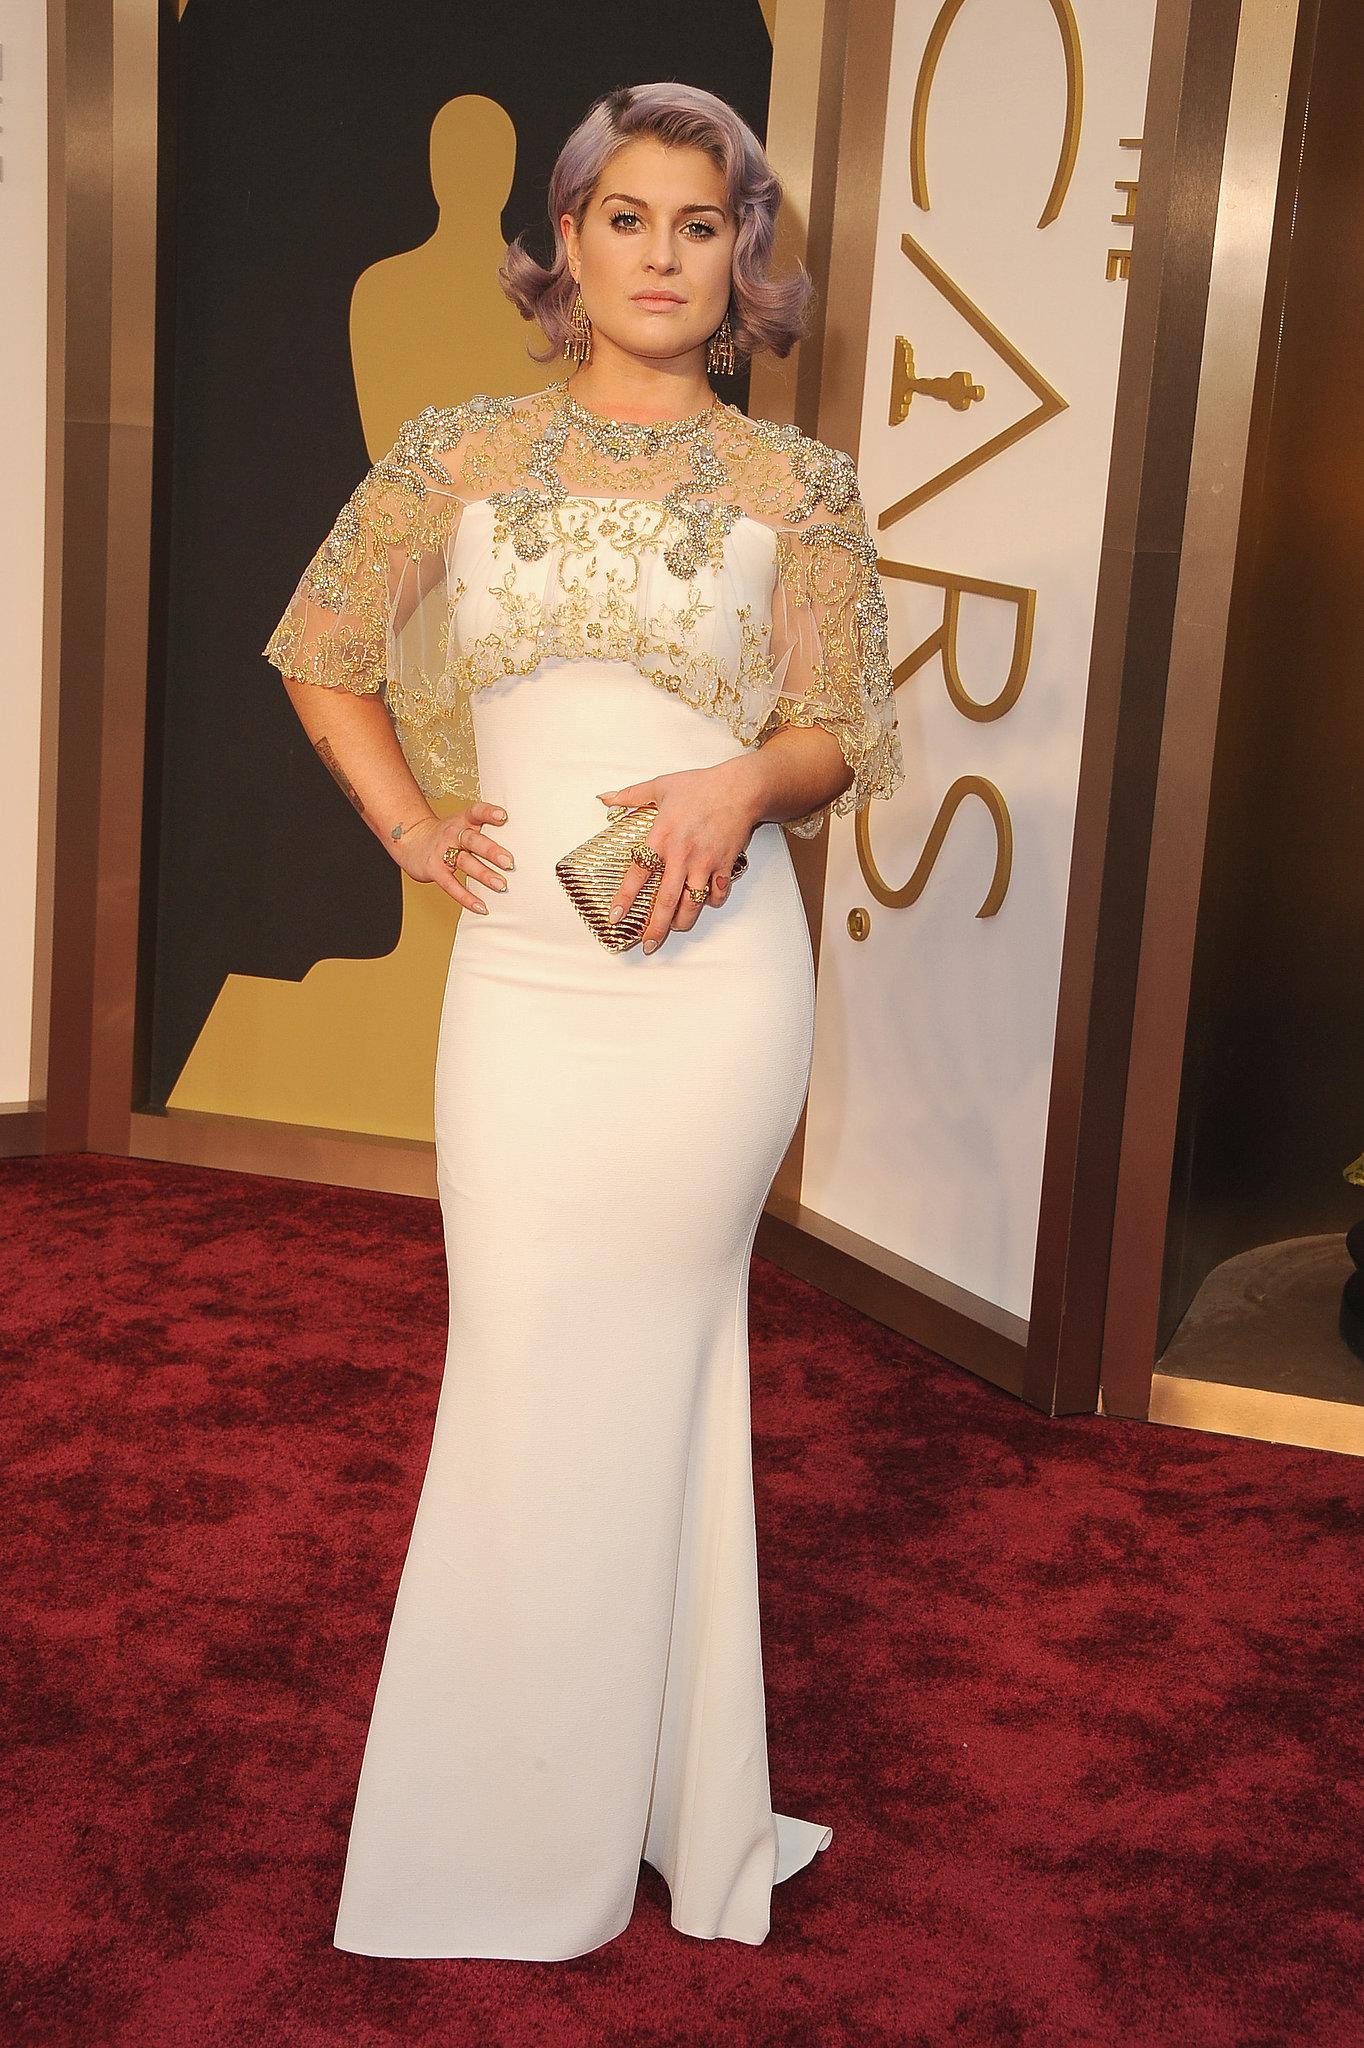 Kelly Osbourne at the 2014 Oscars